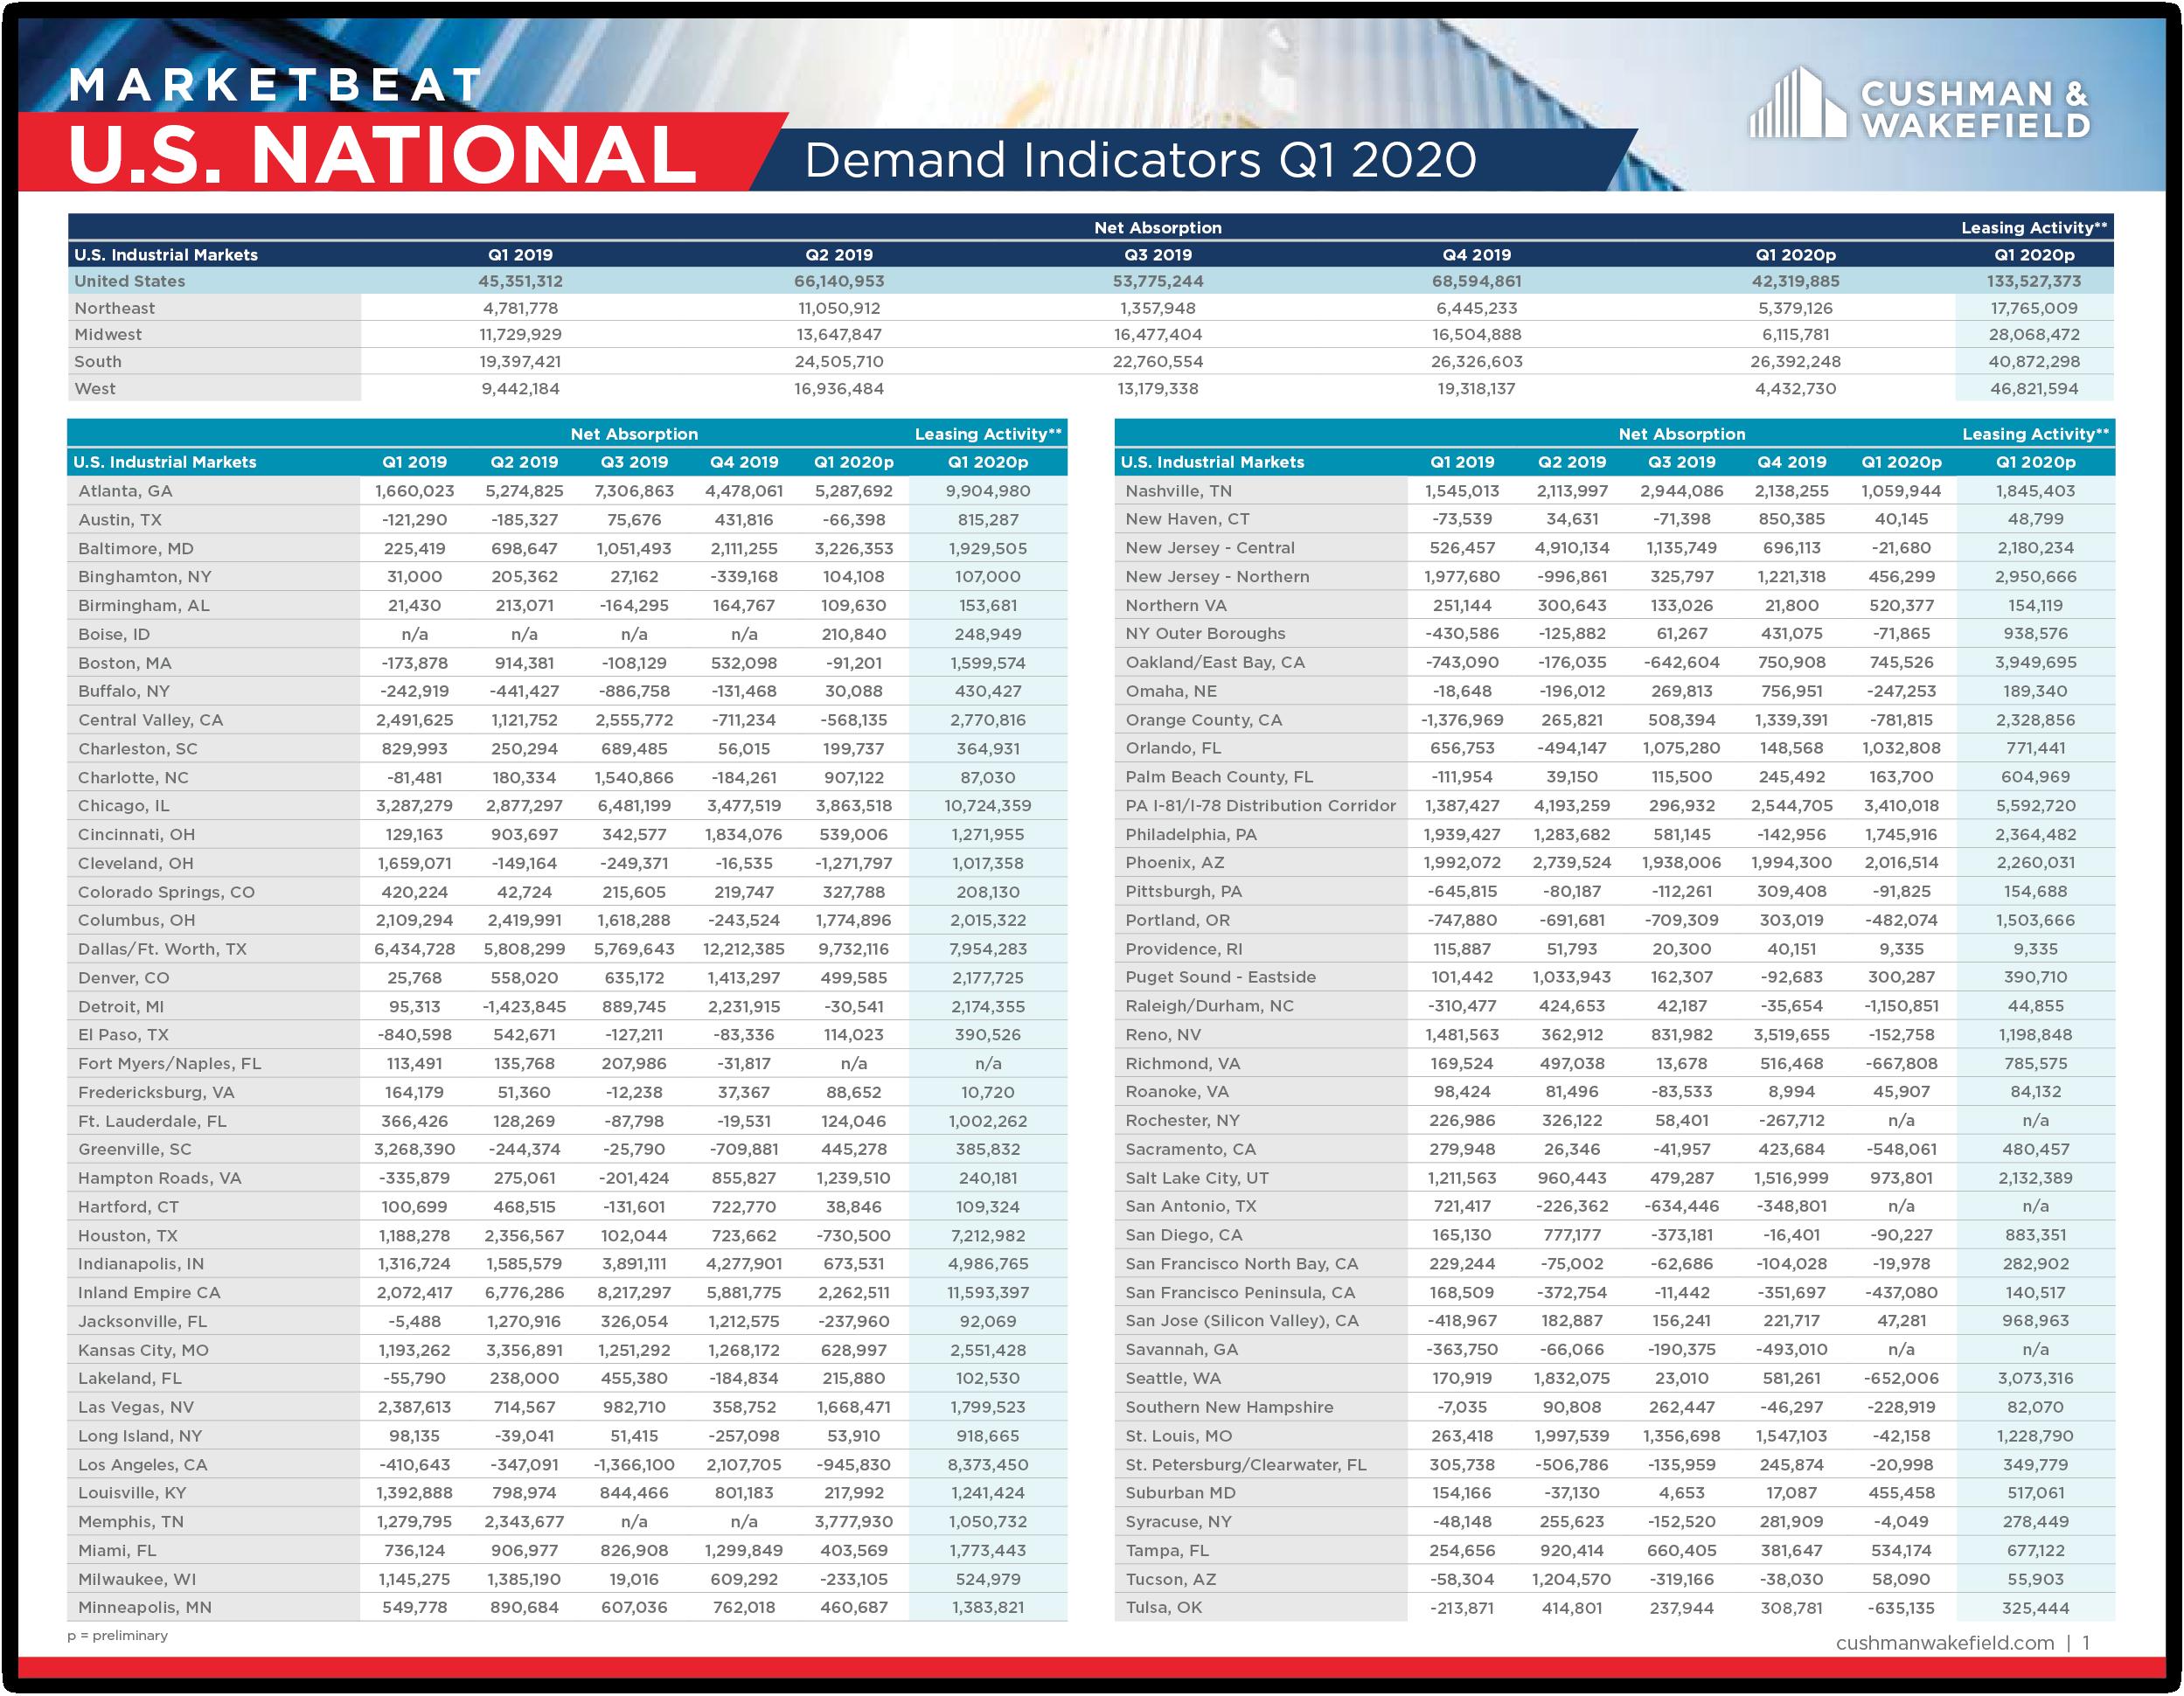 US Industrial MarketBeat Thumbnail